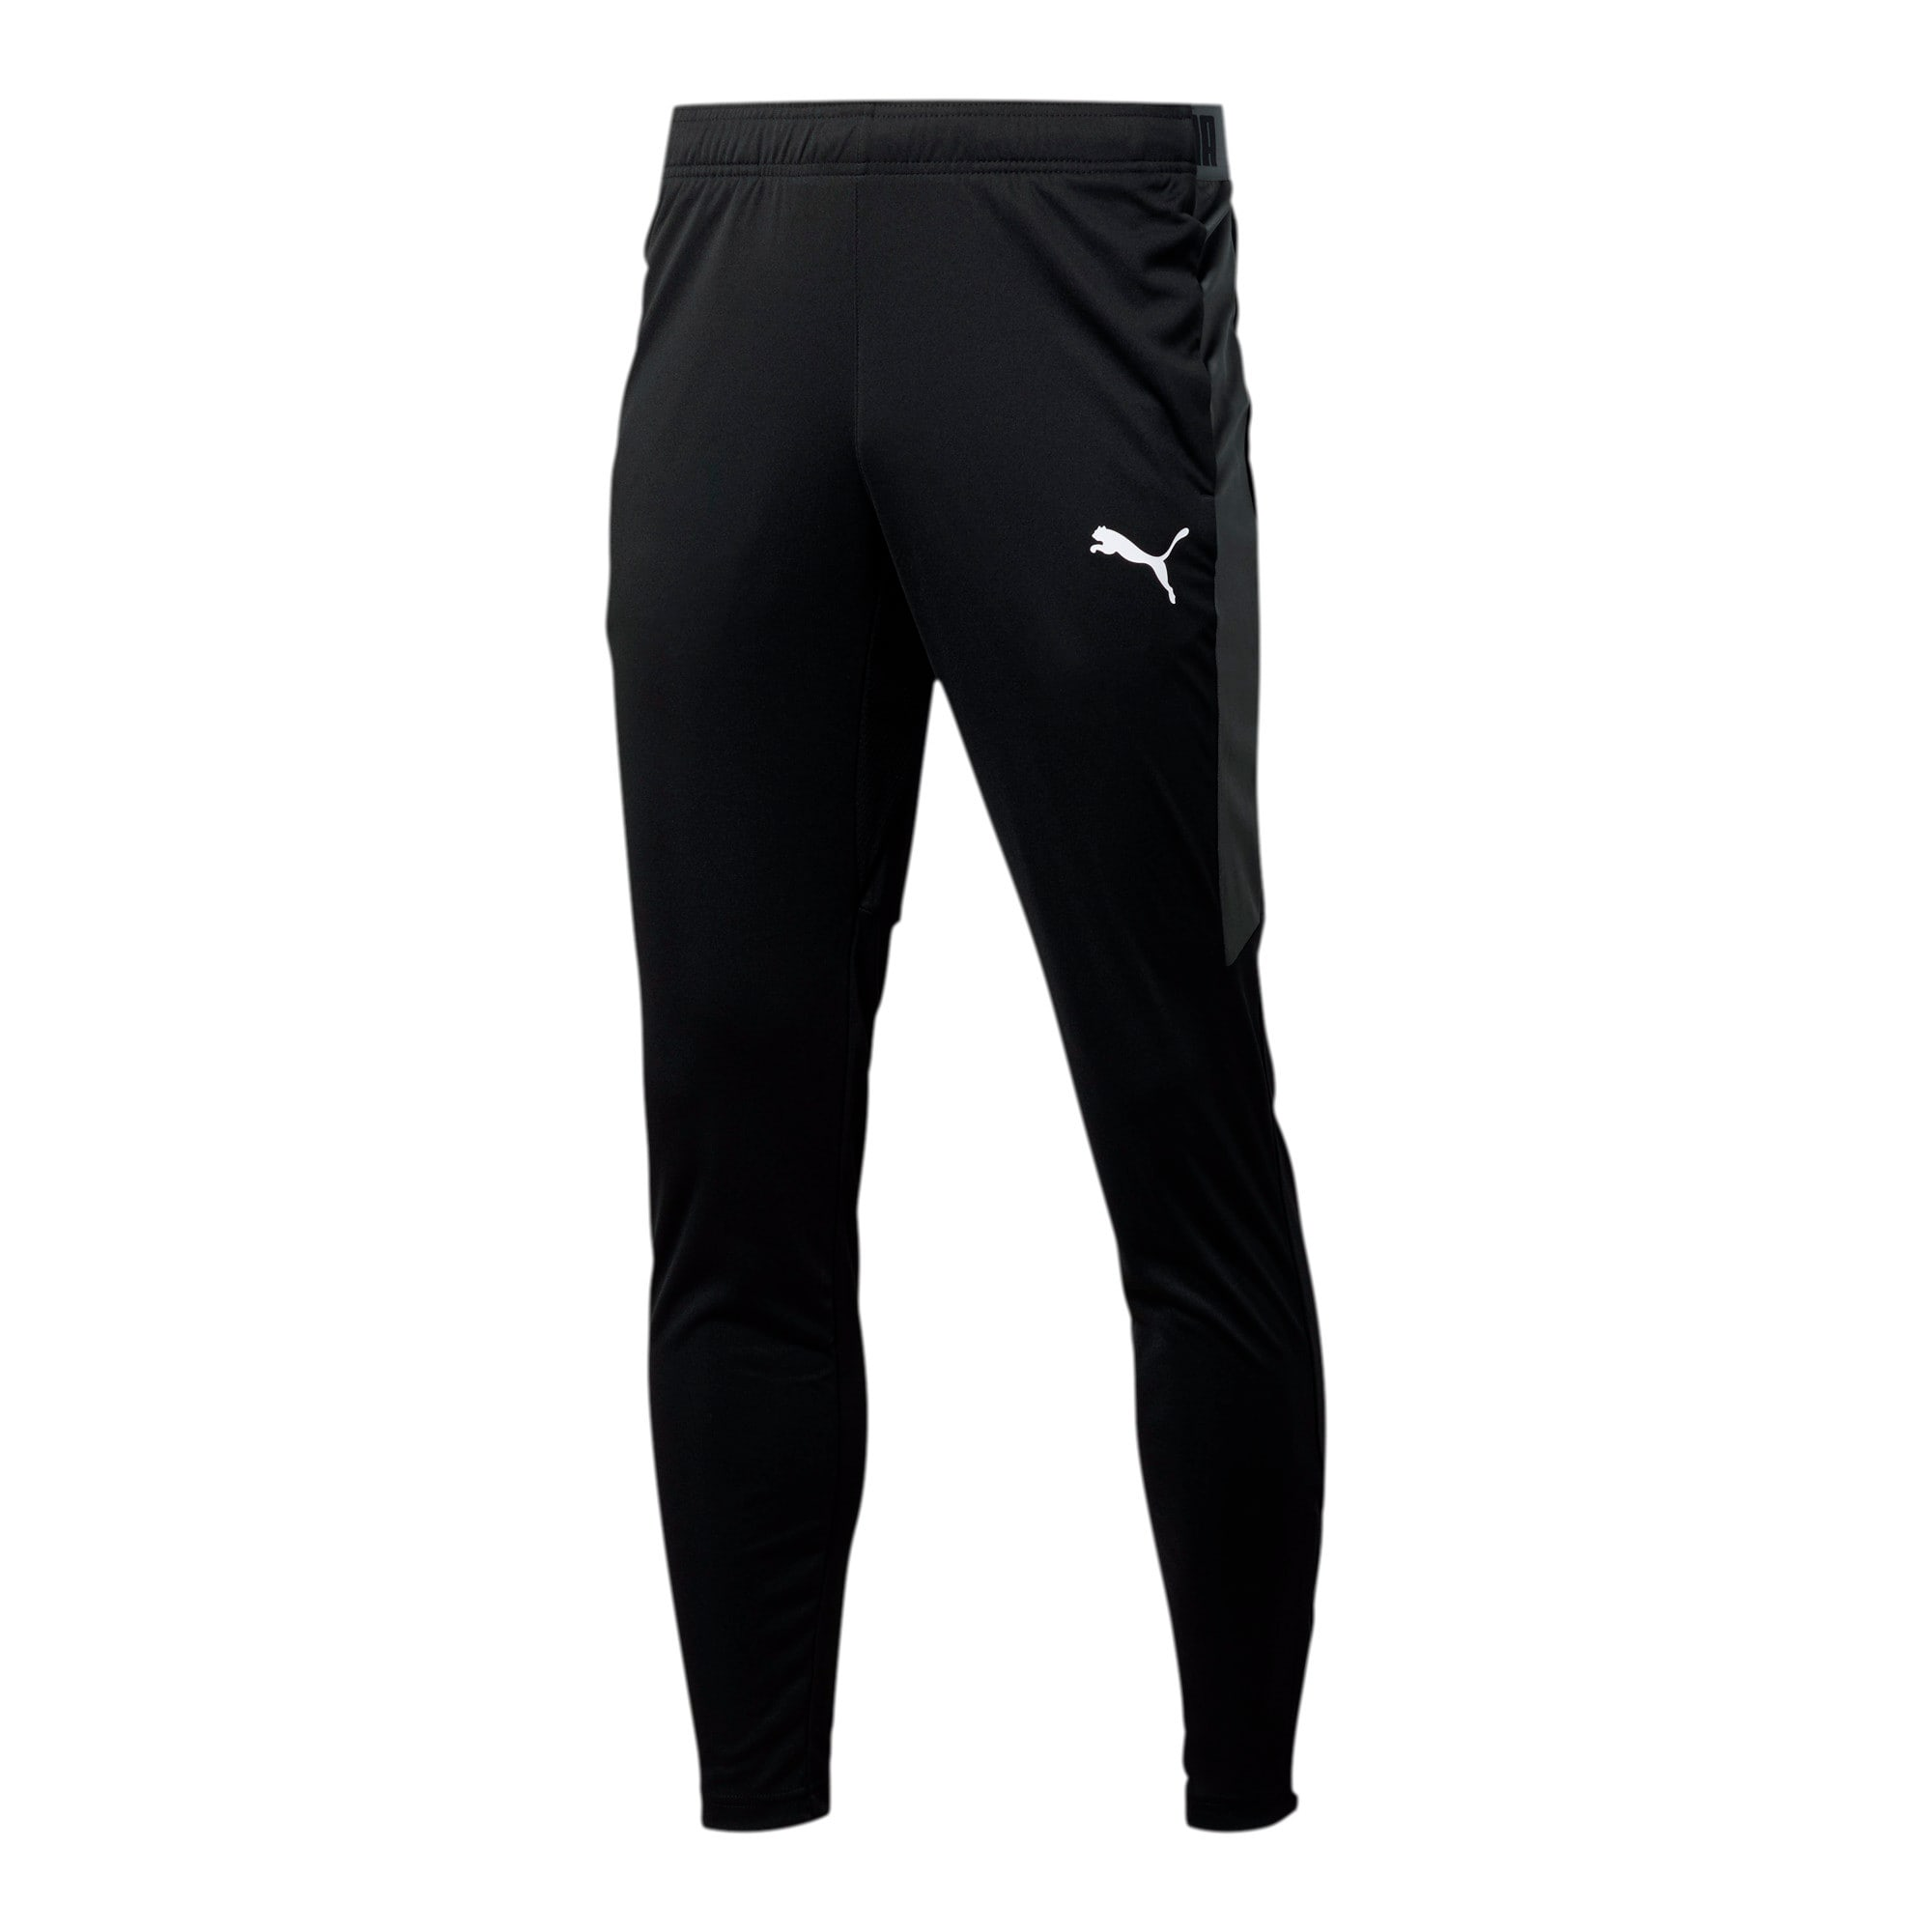 Miniatura 2 de Pantalones Speed para hombre, Puma Black-Asphalt, mediano